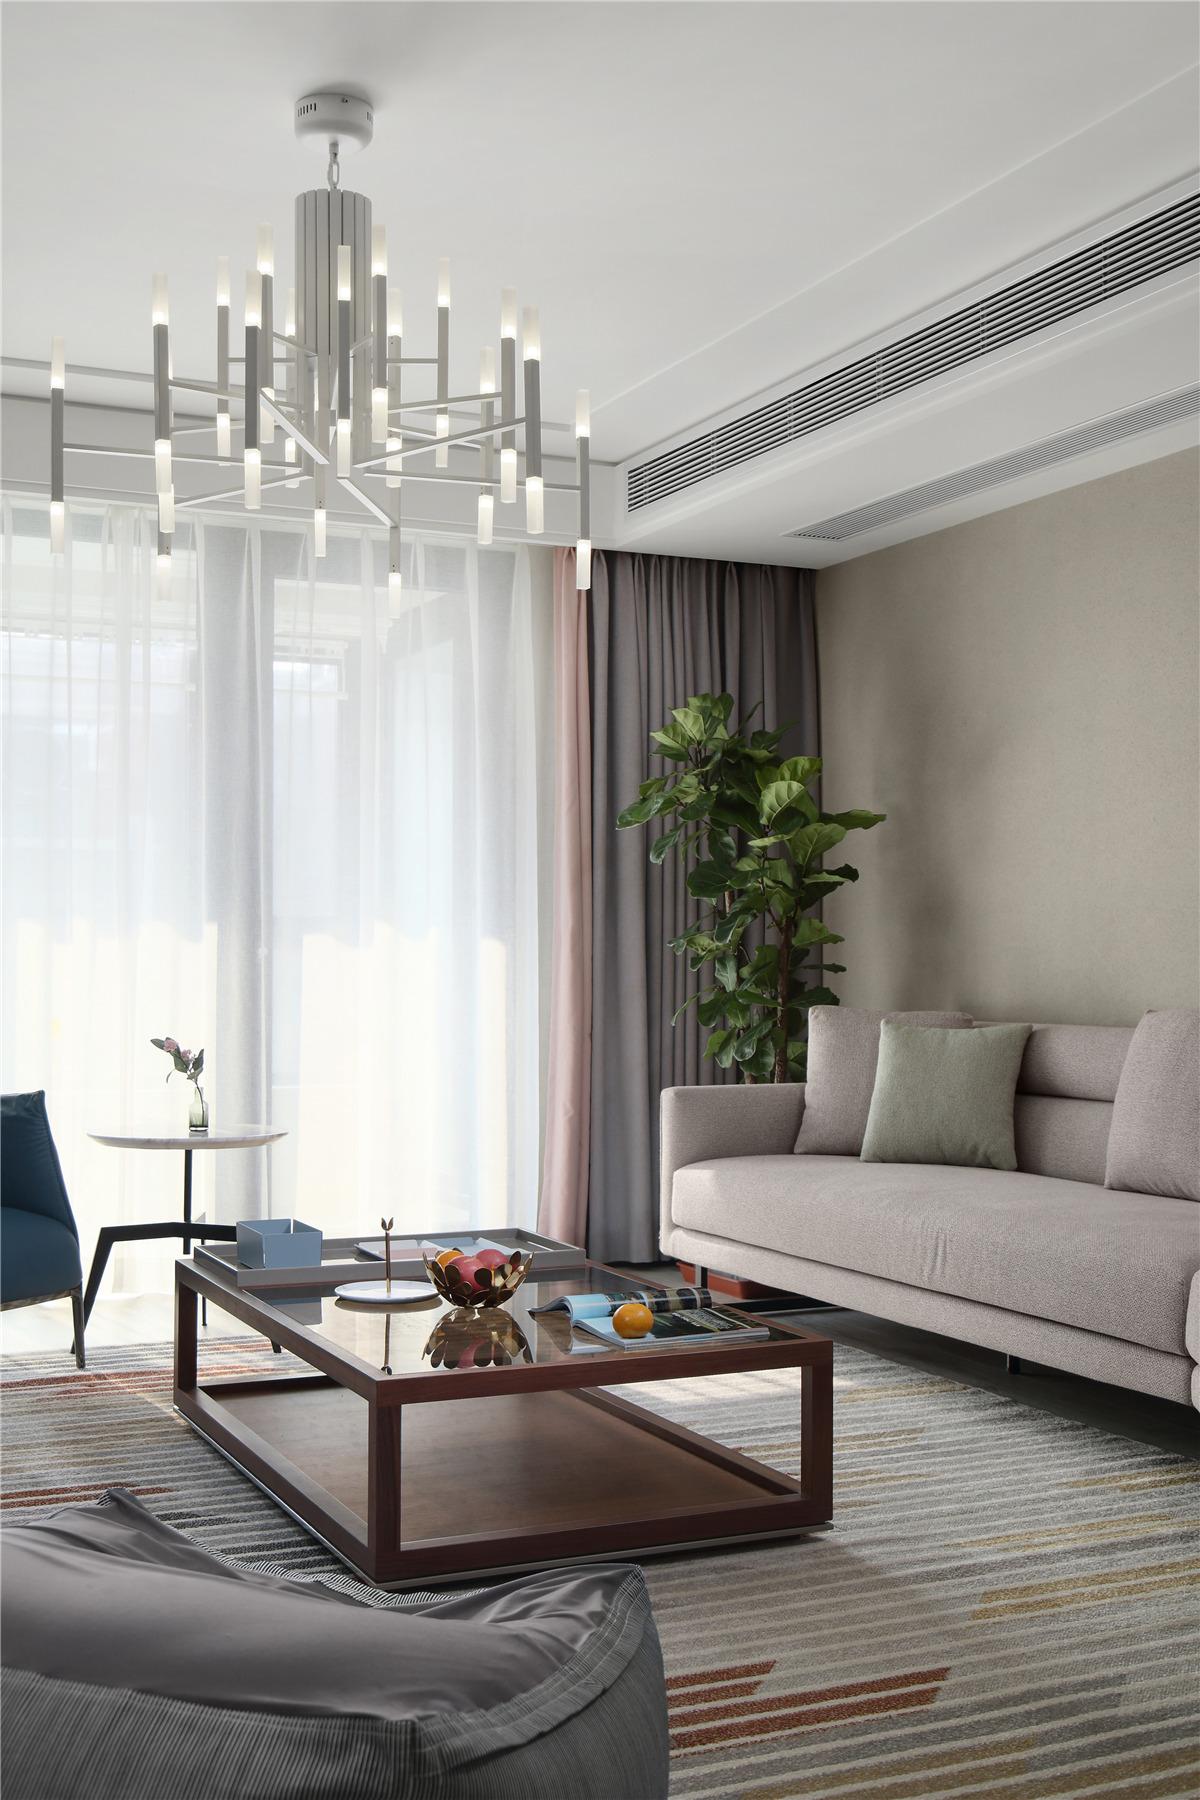 189m²现代风装修客厅吊灯设计图